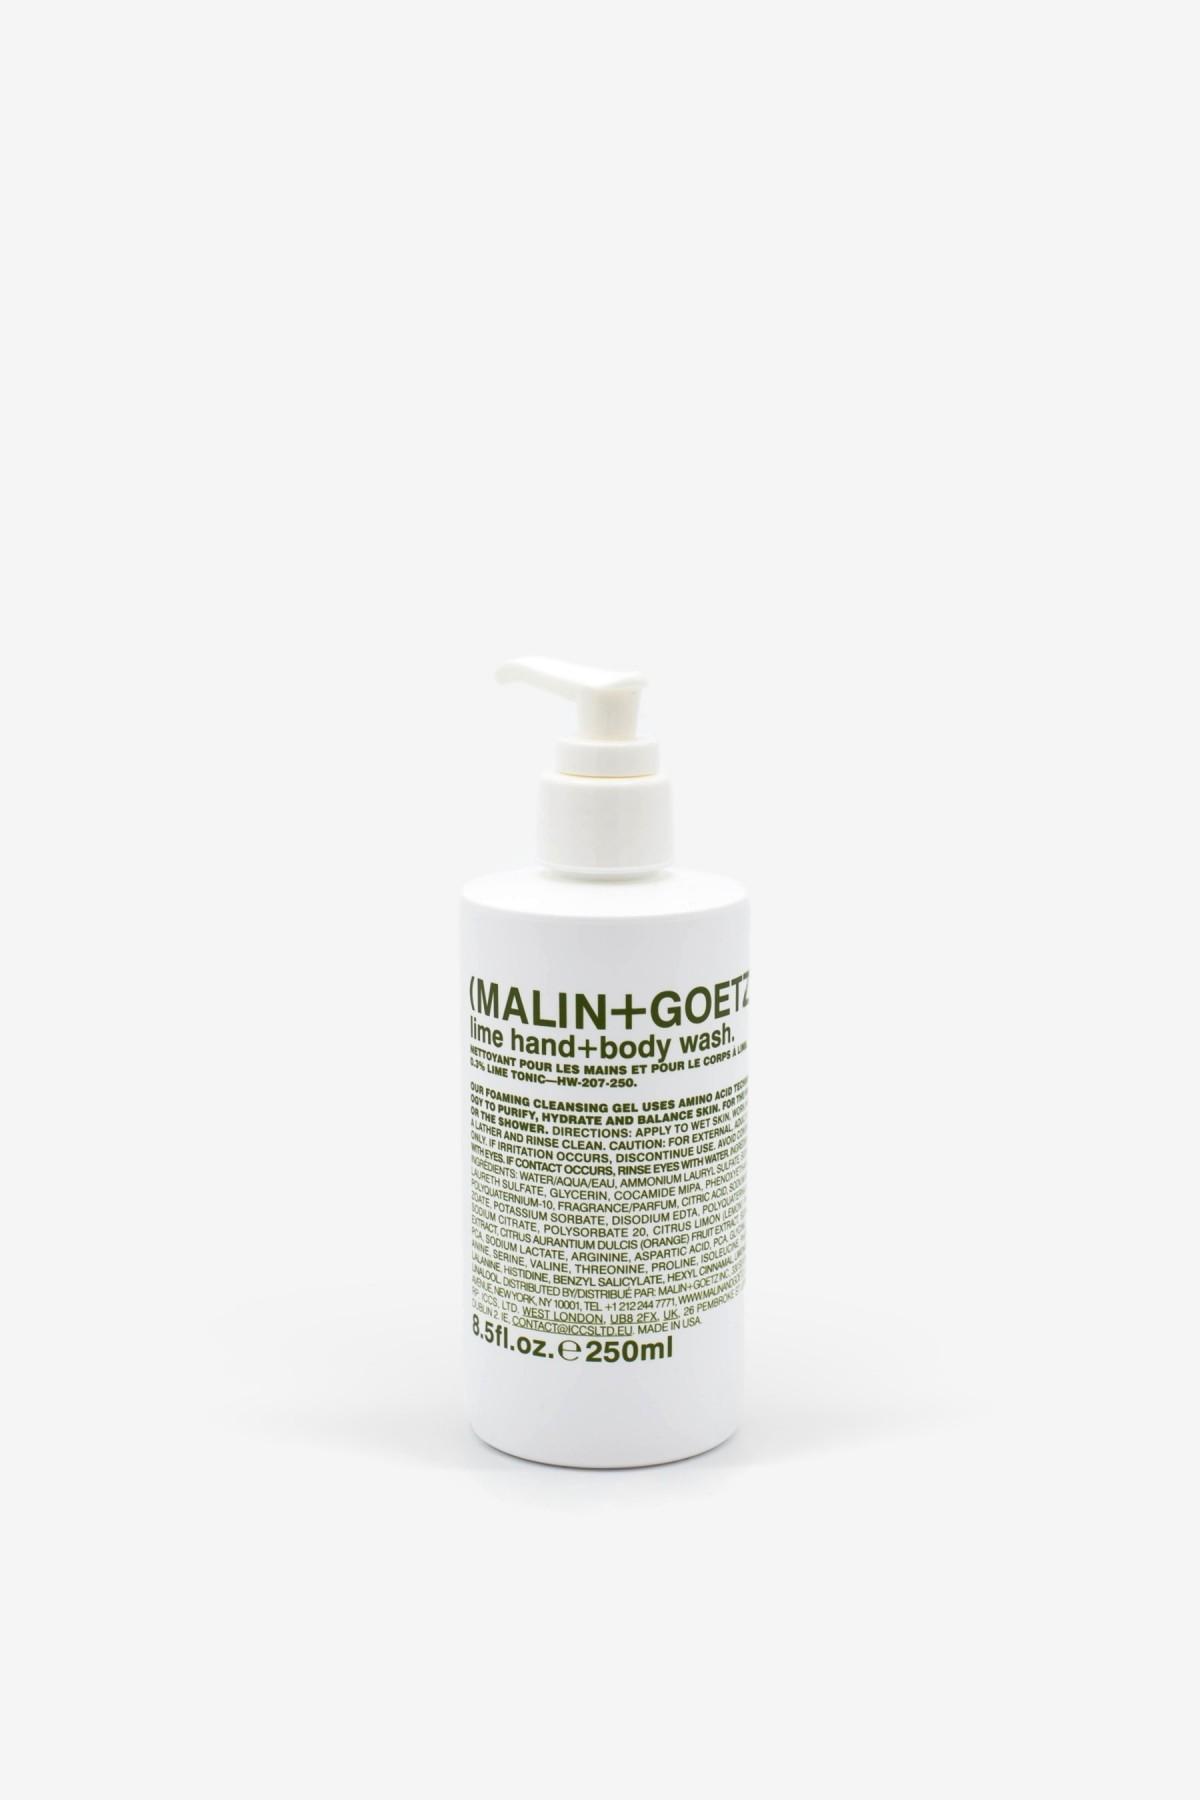 Malin+Goetz Lime Hand + Body Wash 250ml in